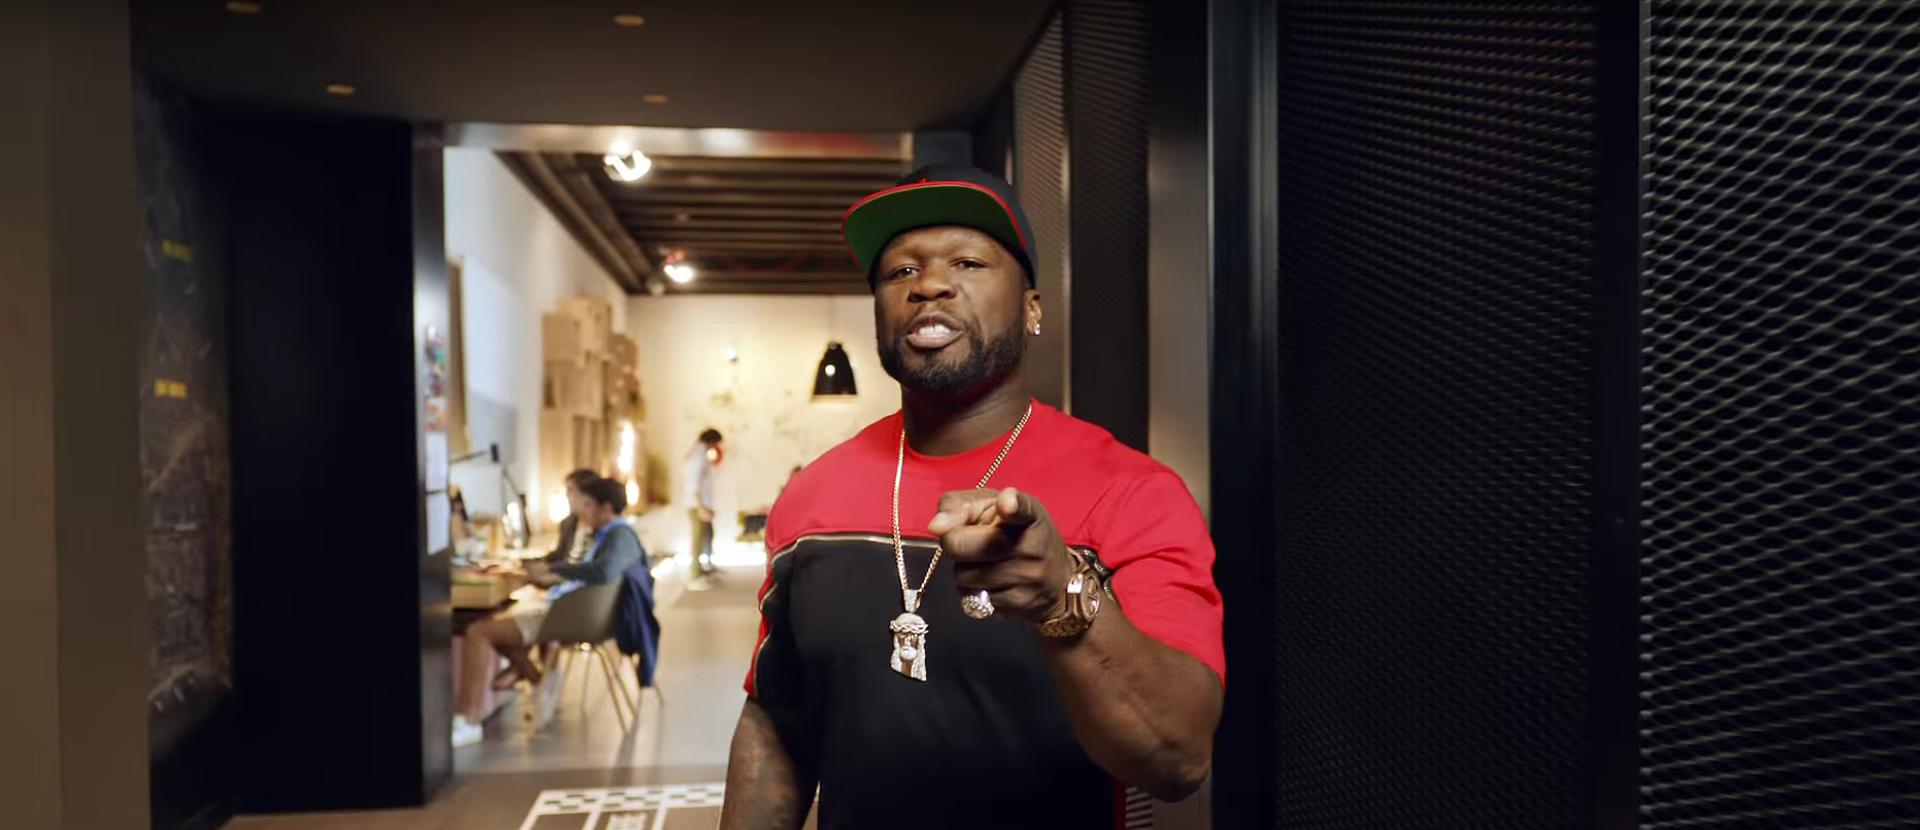 Hostellin' statt hustlin': 50 Cent s neuer Werbecoup